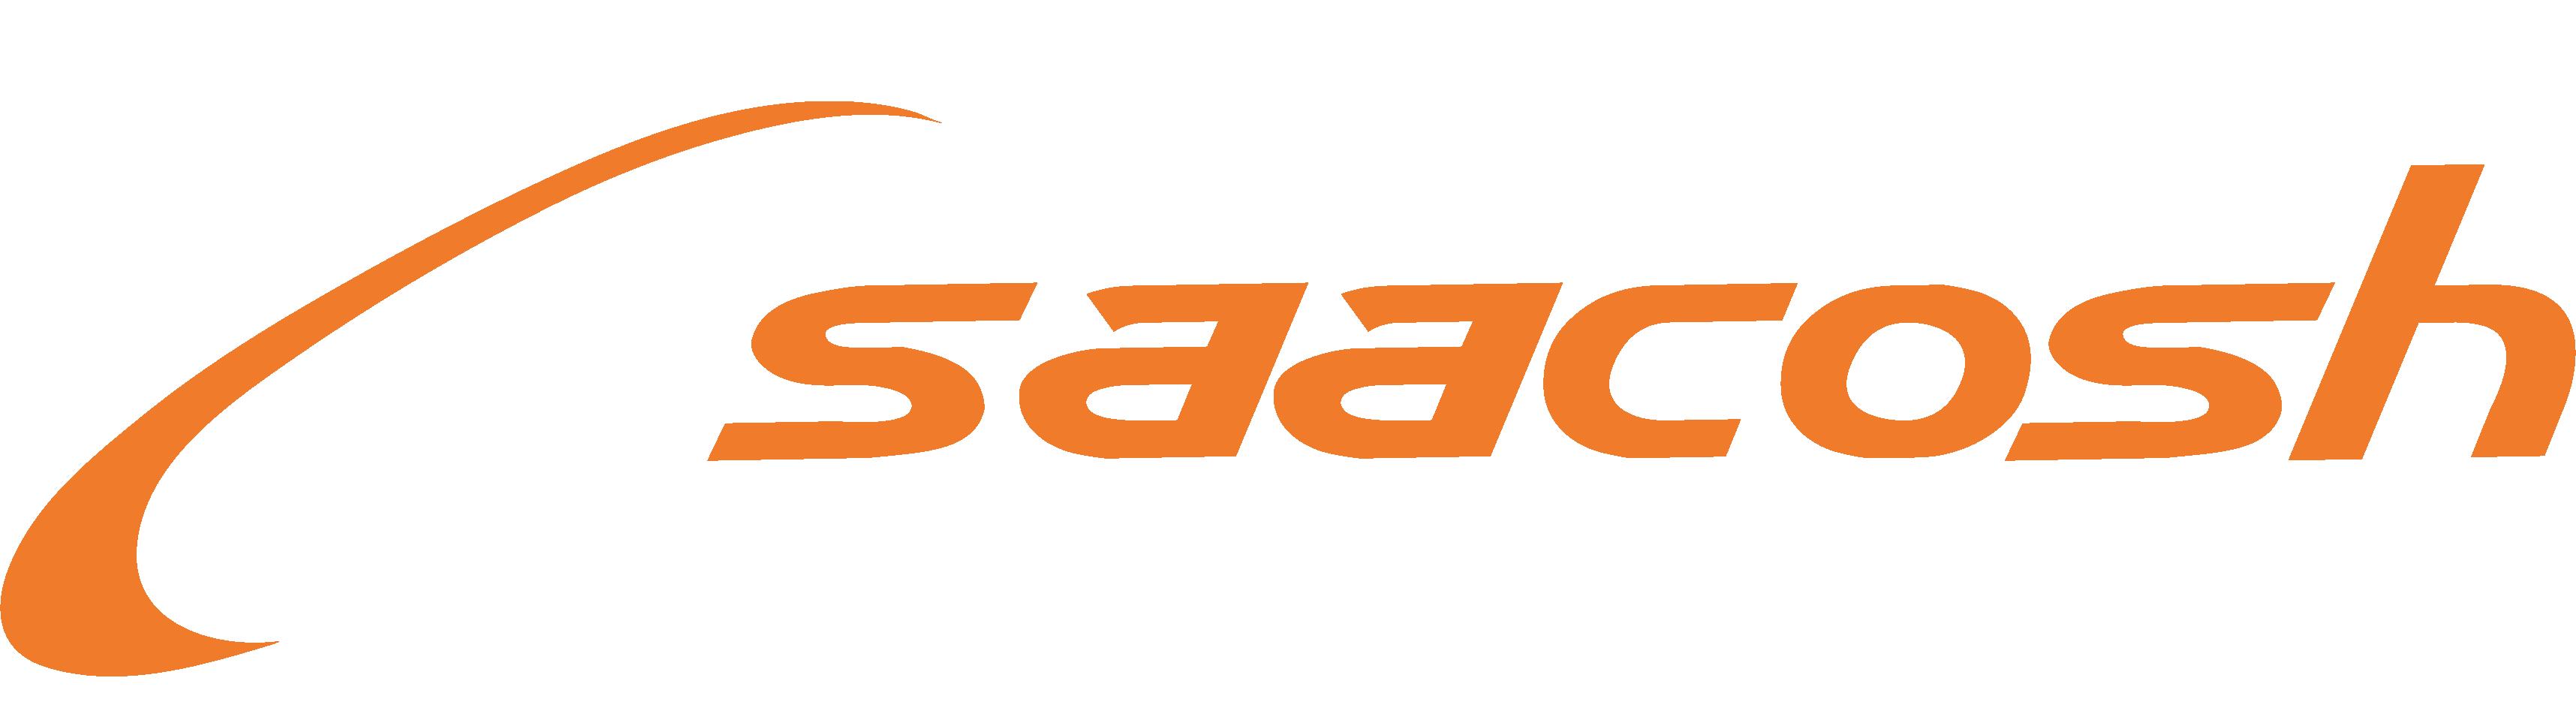 saacosh